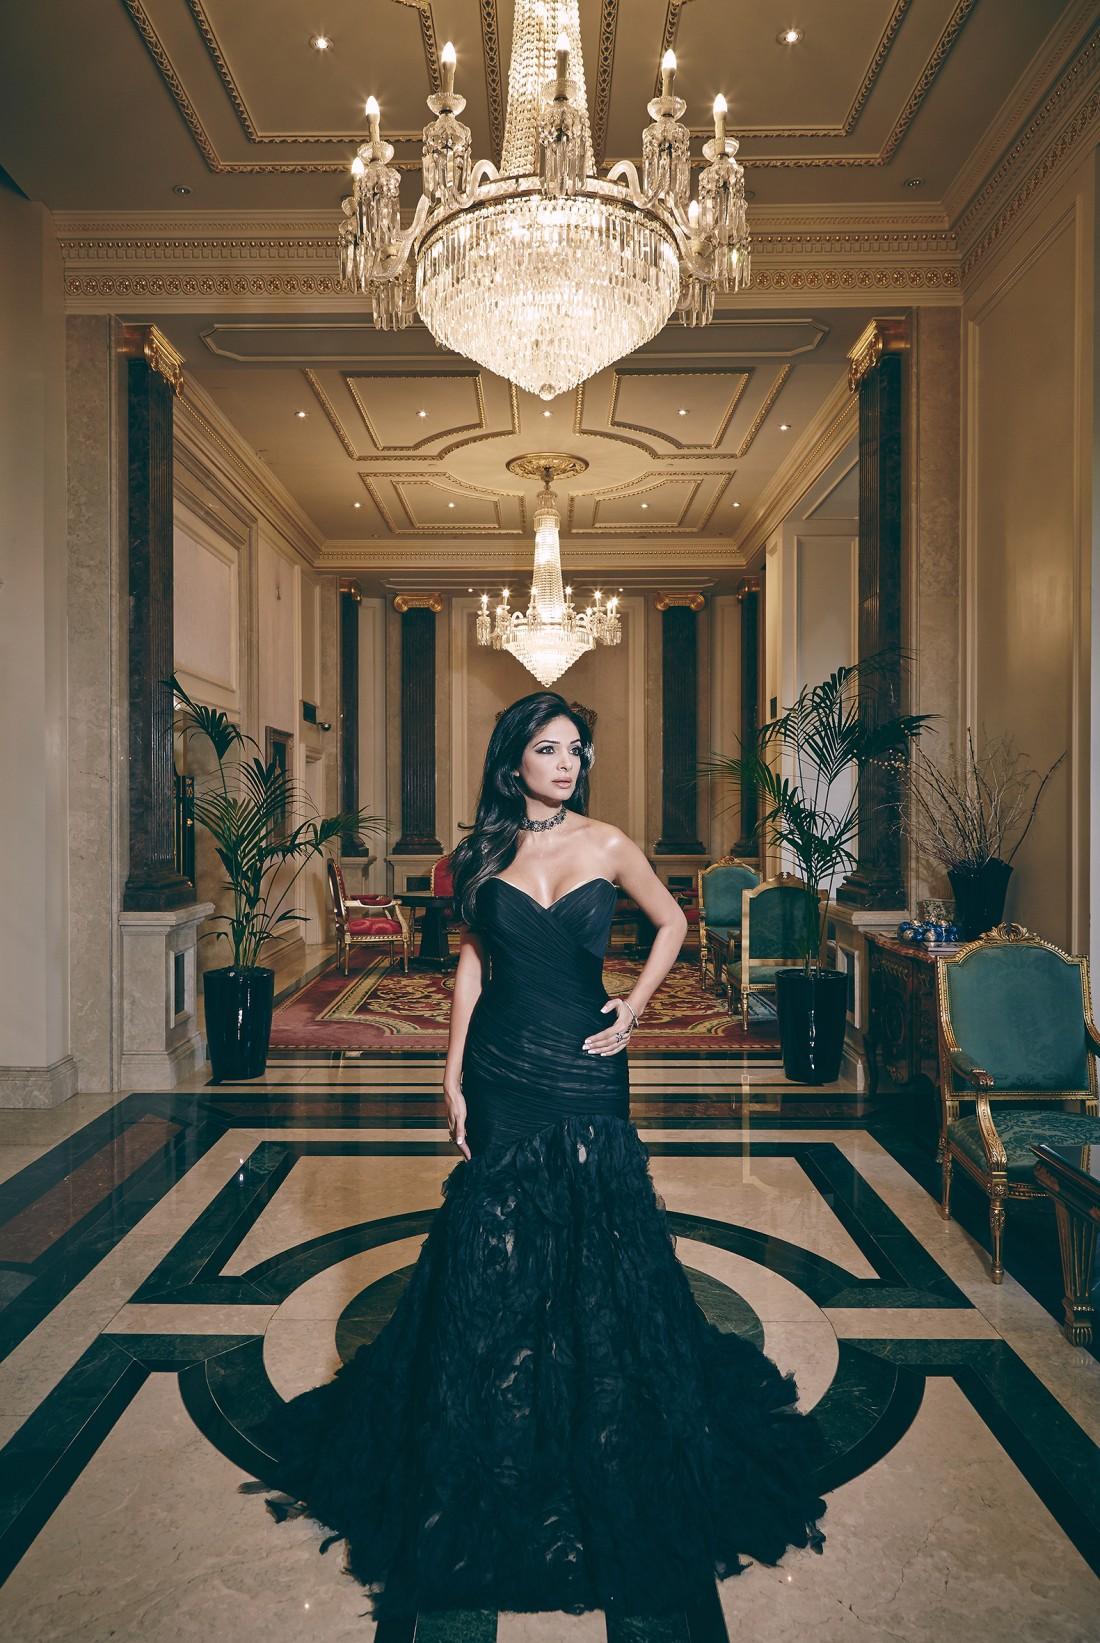 HELLO magazine India March 2015 issue featuring designer Suzanne Neville bespoke gown